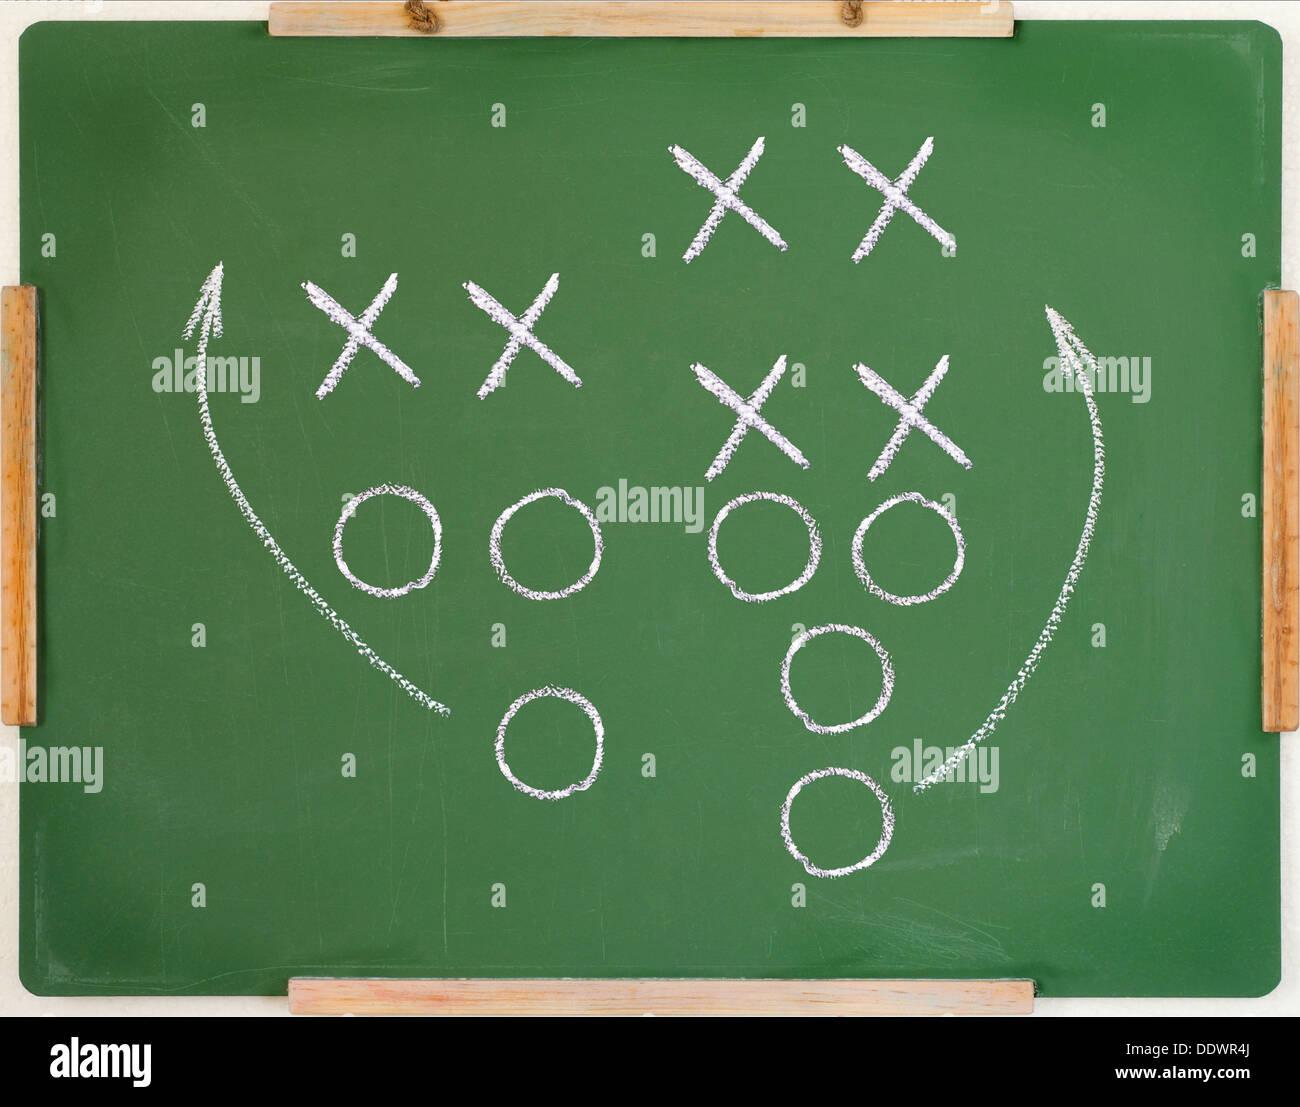 An american football play diagram on a green chalkboard stock an american football play diagram on a green chalkboard pooptronica Images